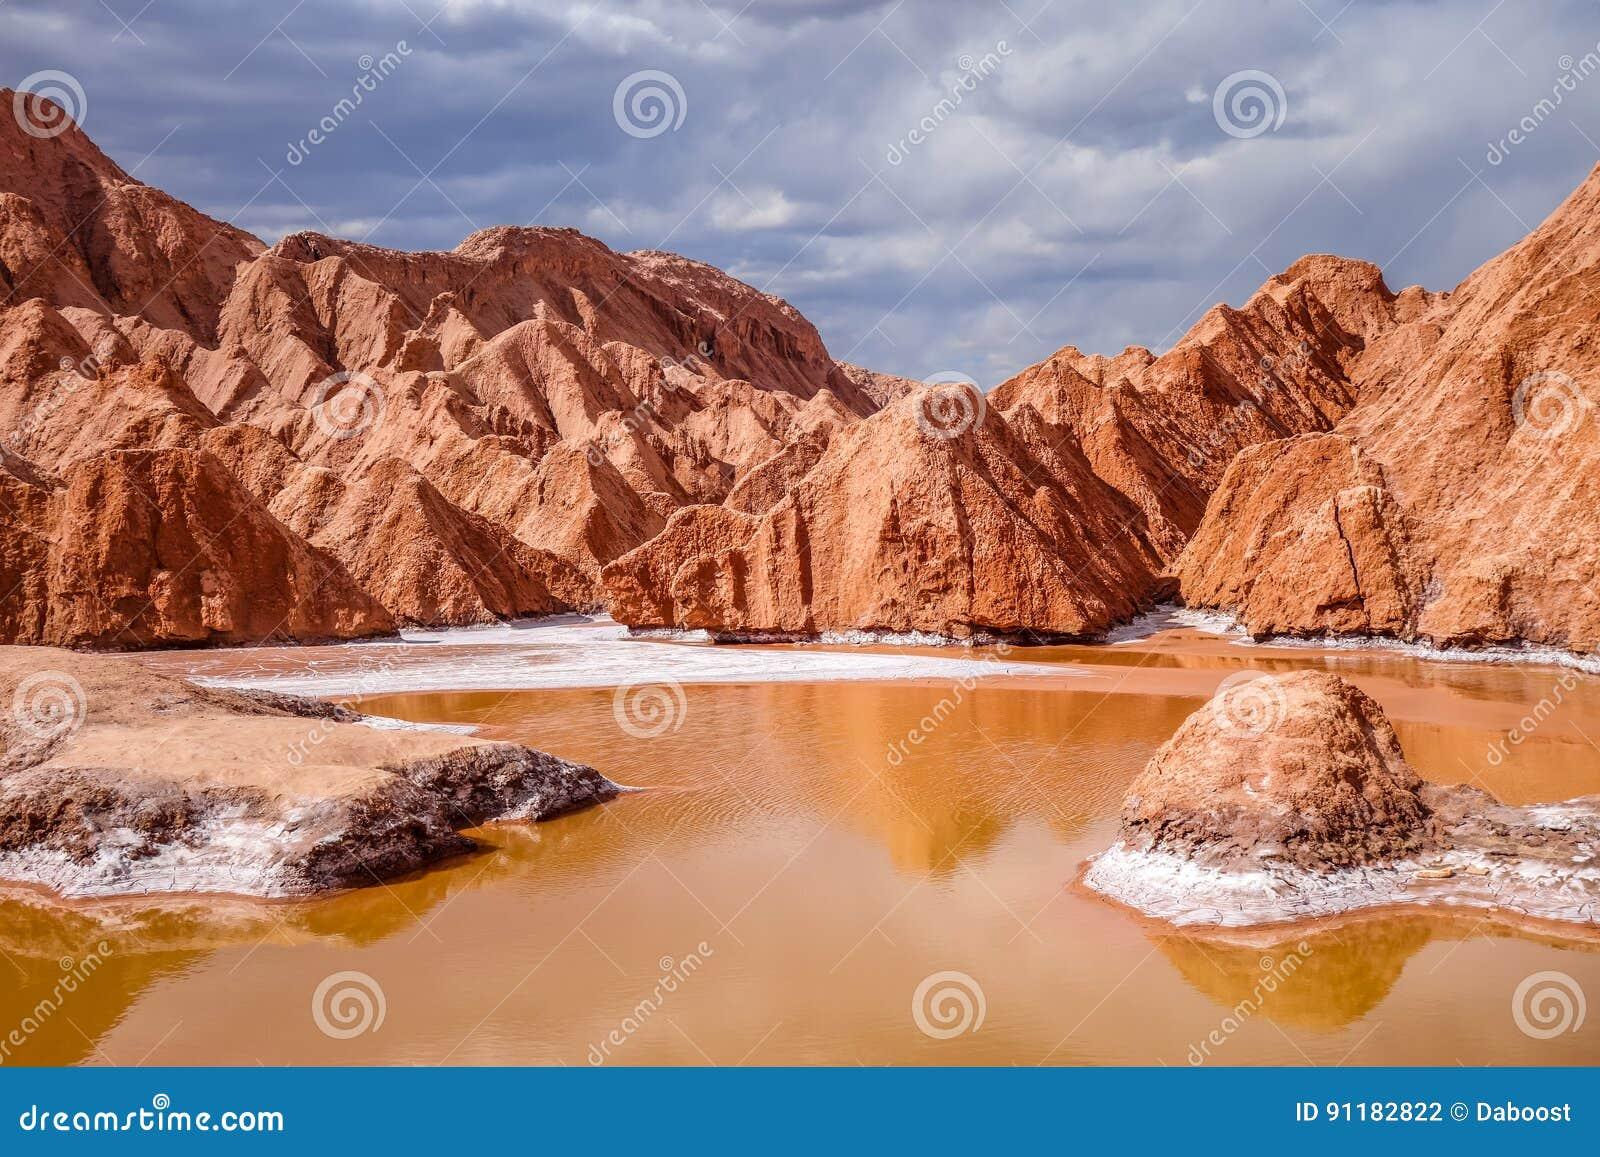 Valle De La Muerte En San Pedro De Atacama Chile Foto De Archivo Imagen De Rojo Bolivia 91182822